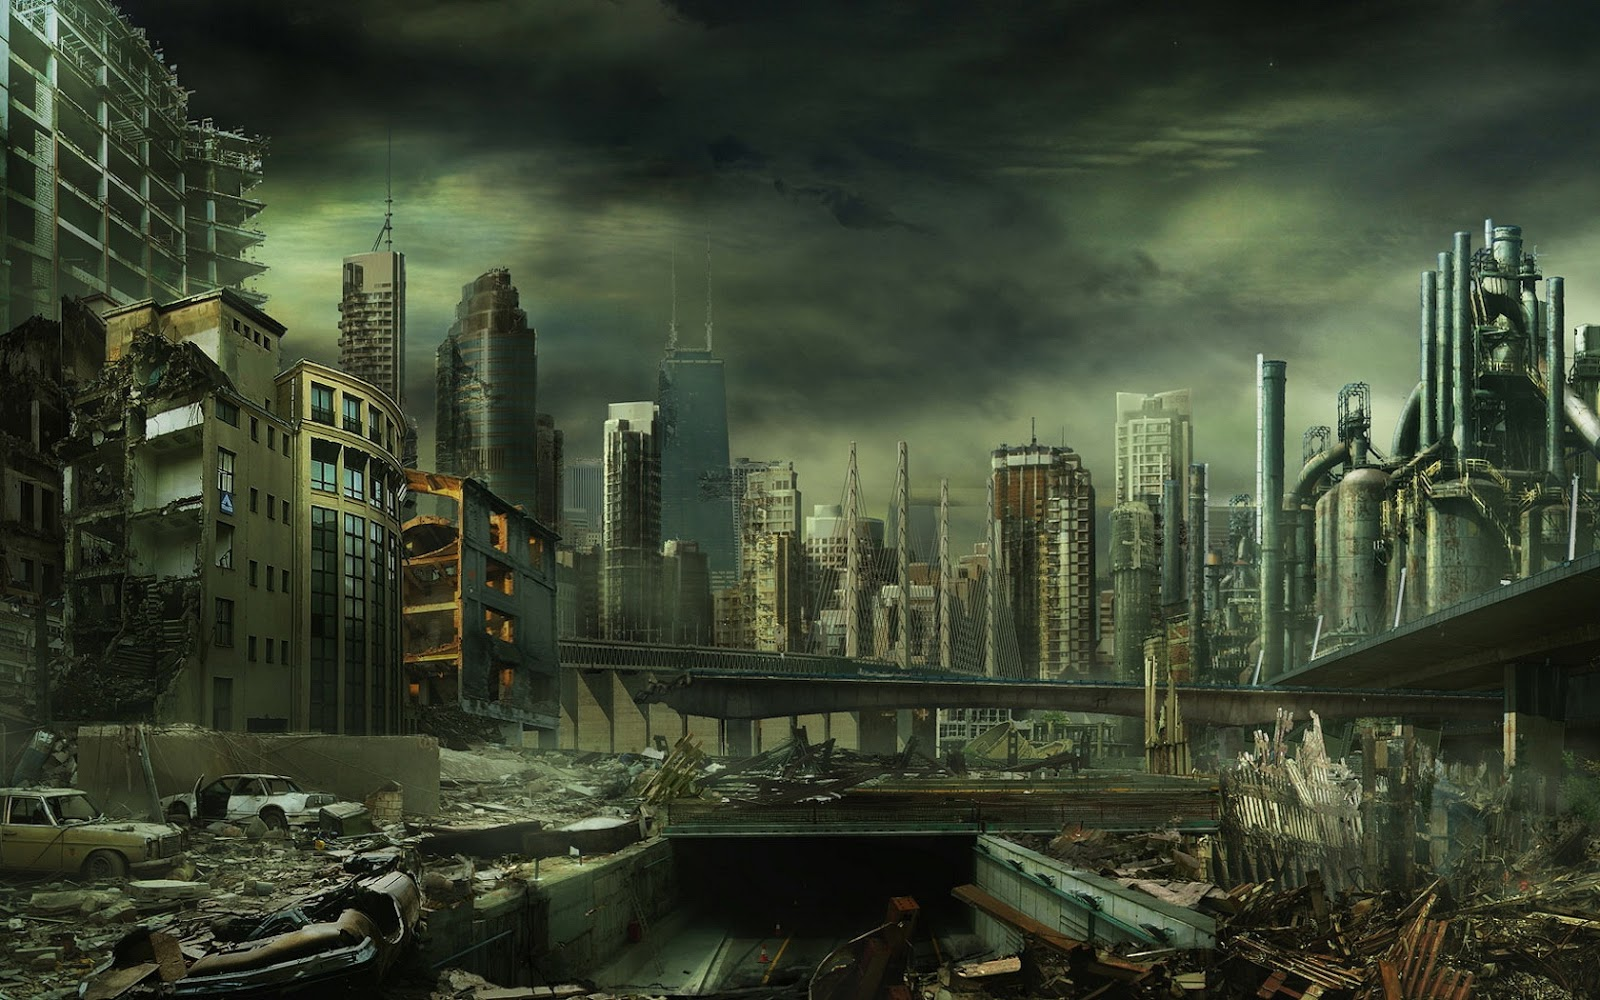 http://2.bp.blogspot.com/-Q3G1cft7FZM/UPJc5GALW8I/AAAAAAAAAMA/cUxoY1w2BX0/s1600/destroy-city-view-with-black-clouds-background-cartoon-hd-wallpapers-1680-x-1050.jpg